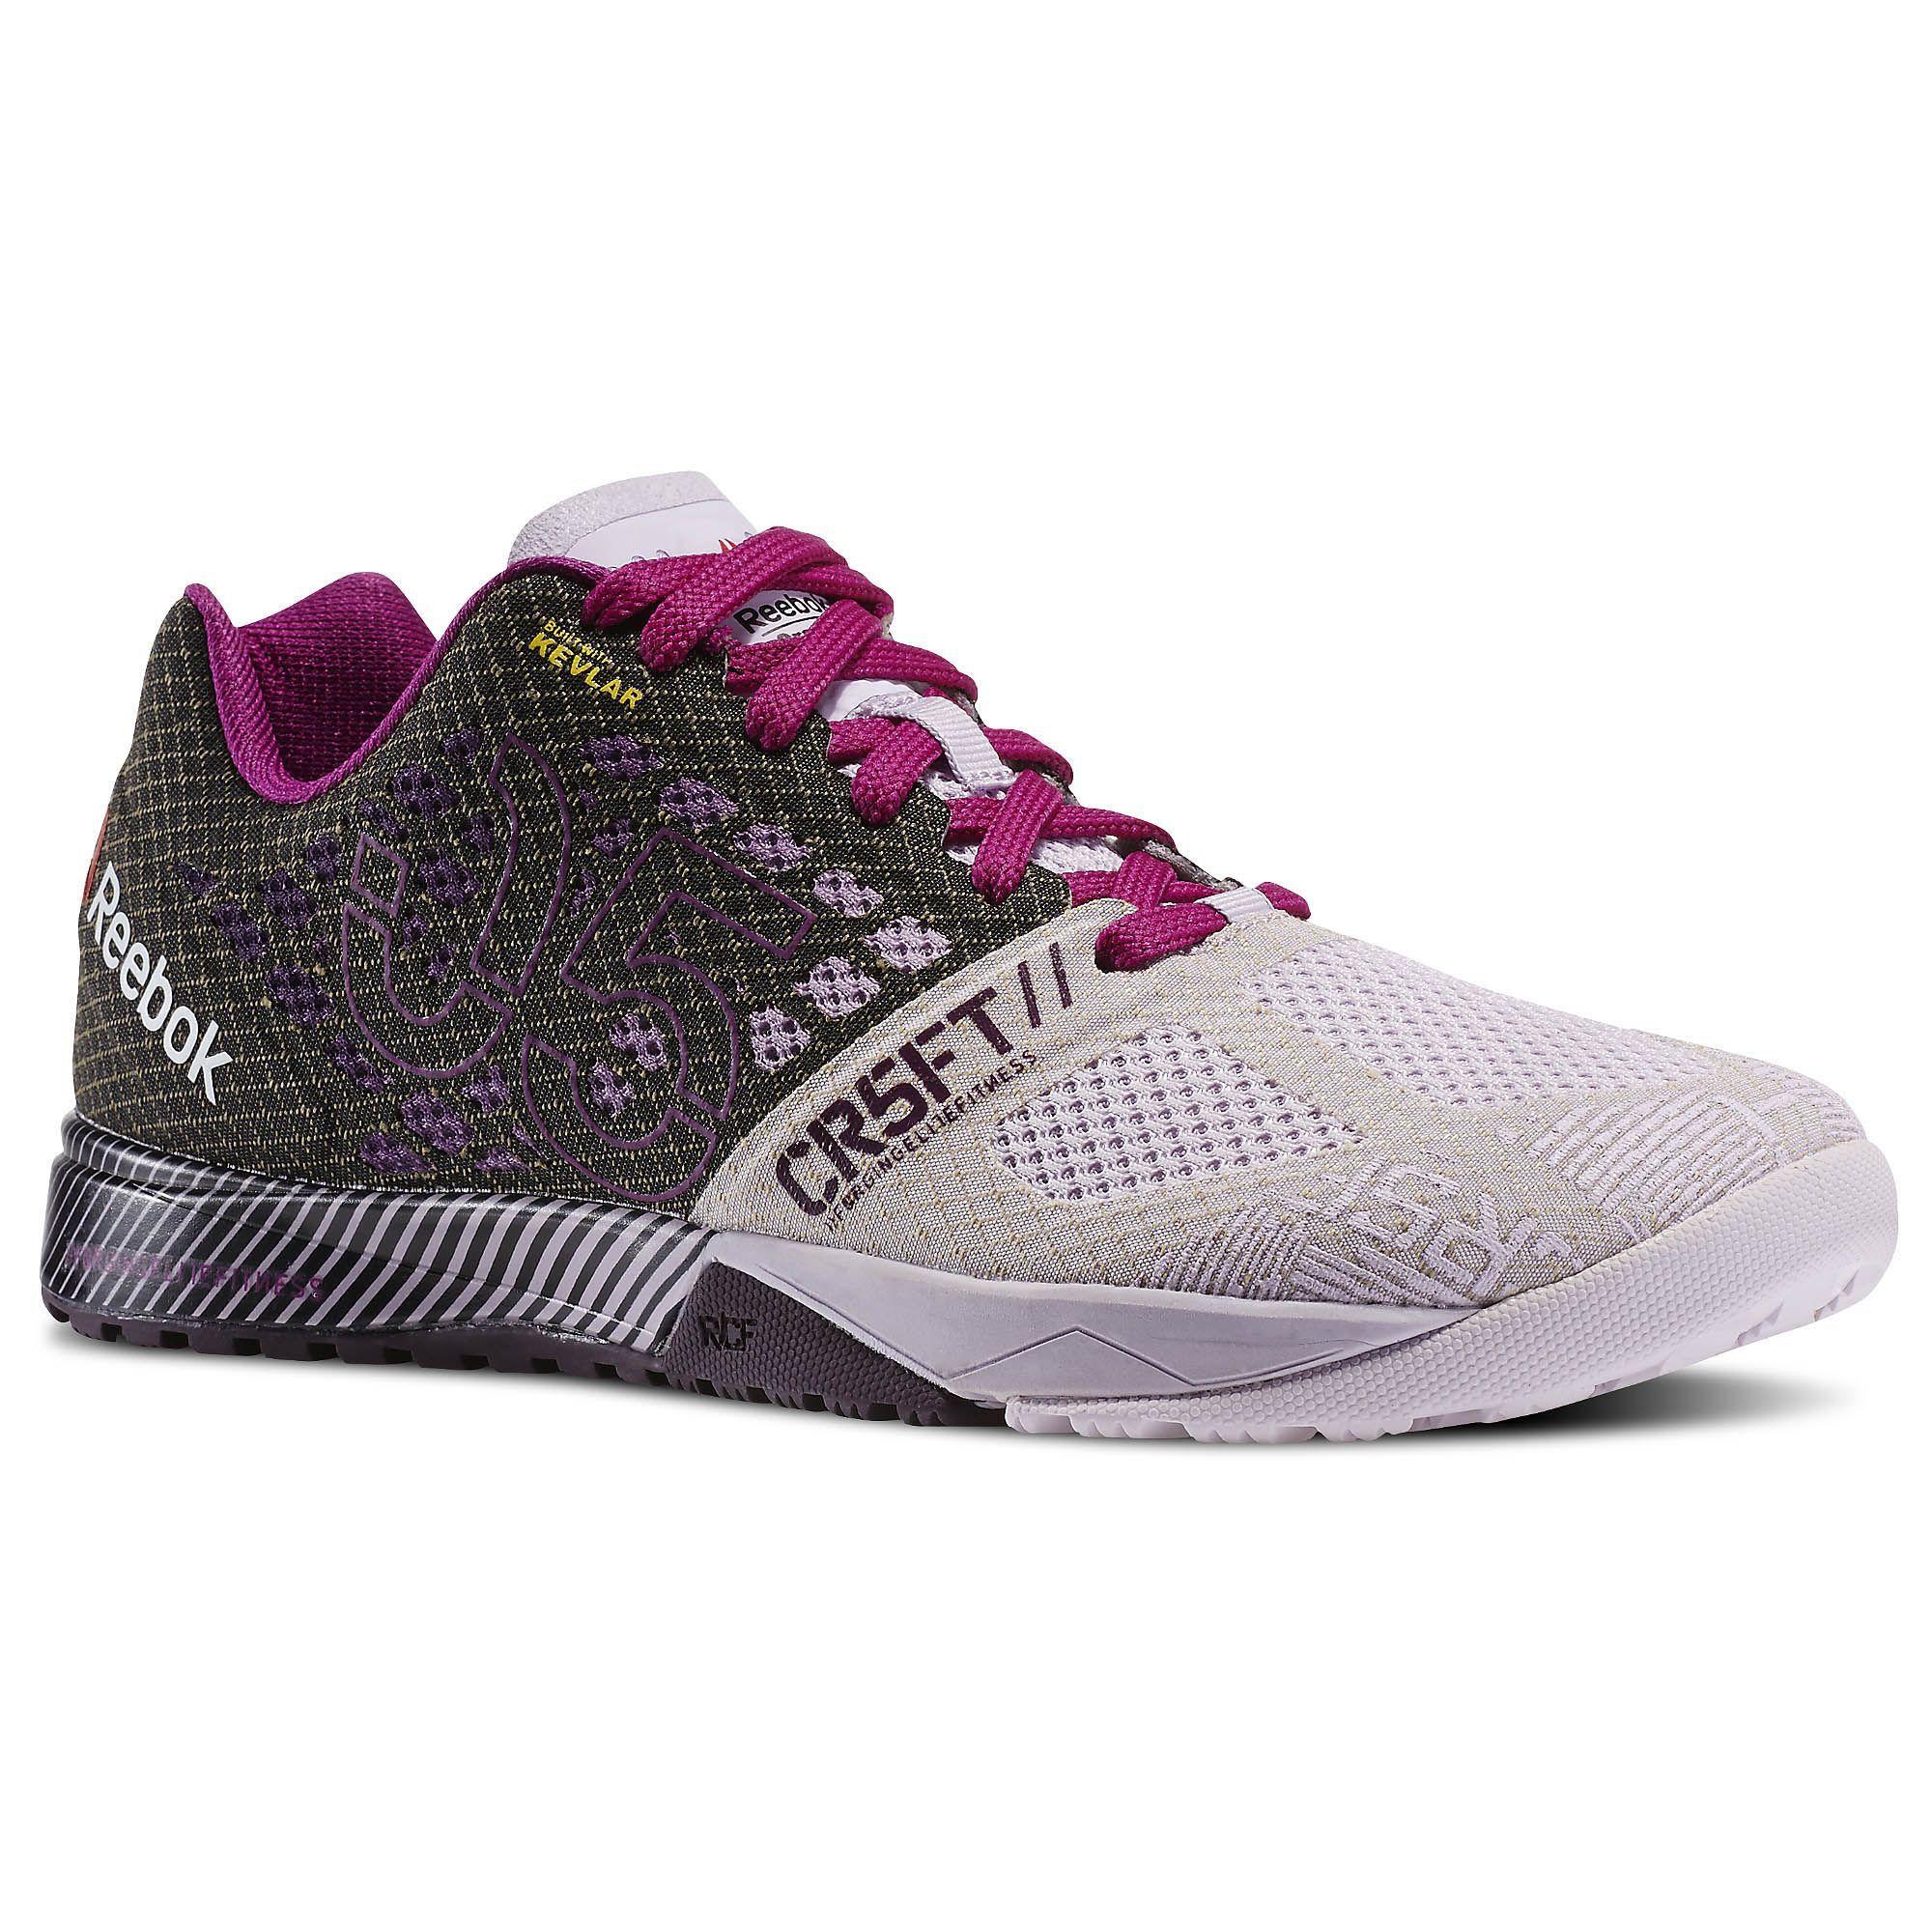 reebok nano 2 womens purple cheap   OFF45% The Largest Catalog Discounts 794f10eda